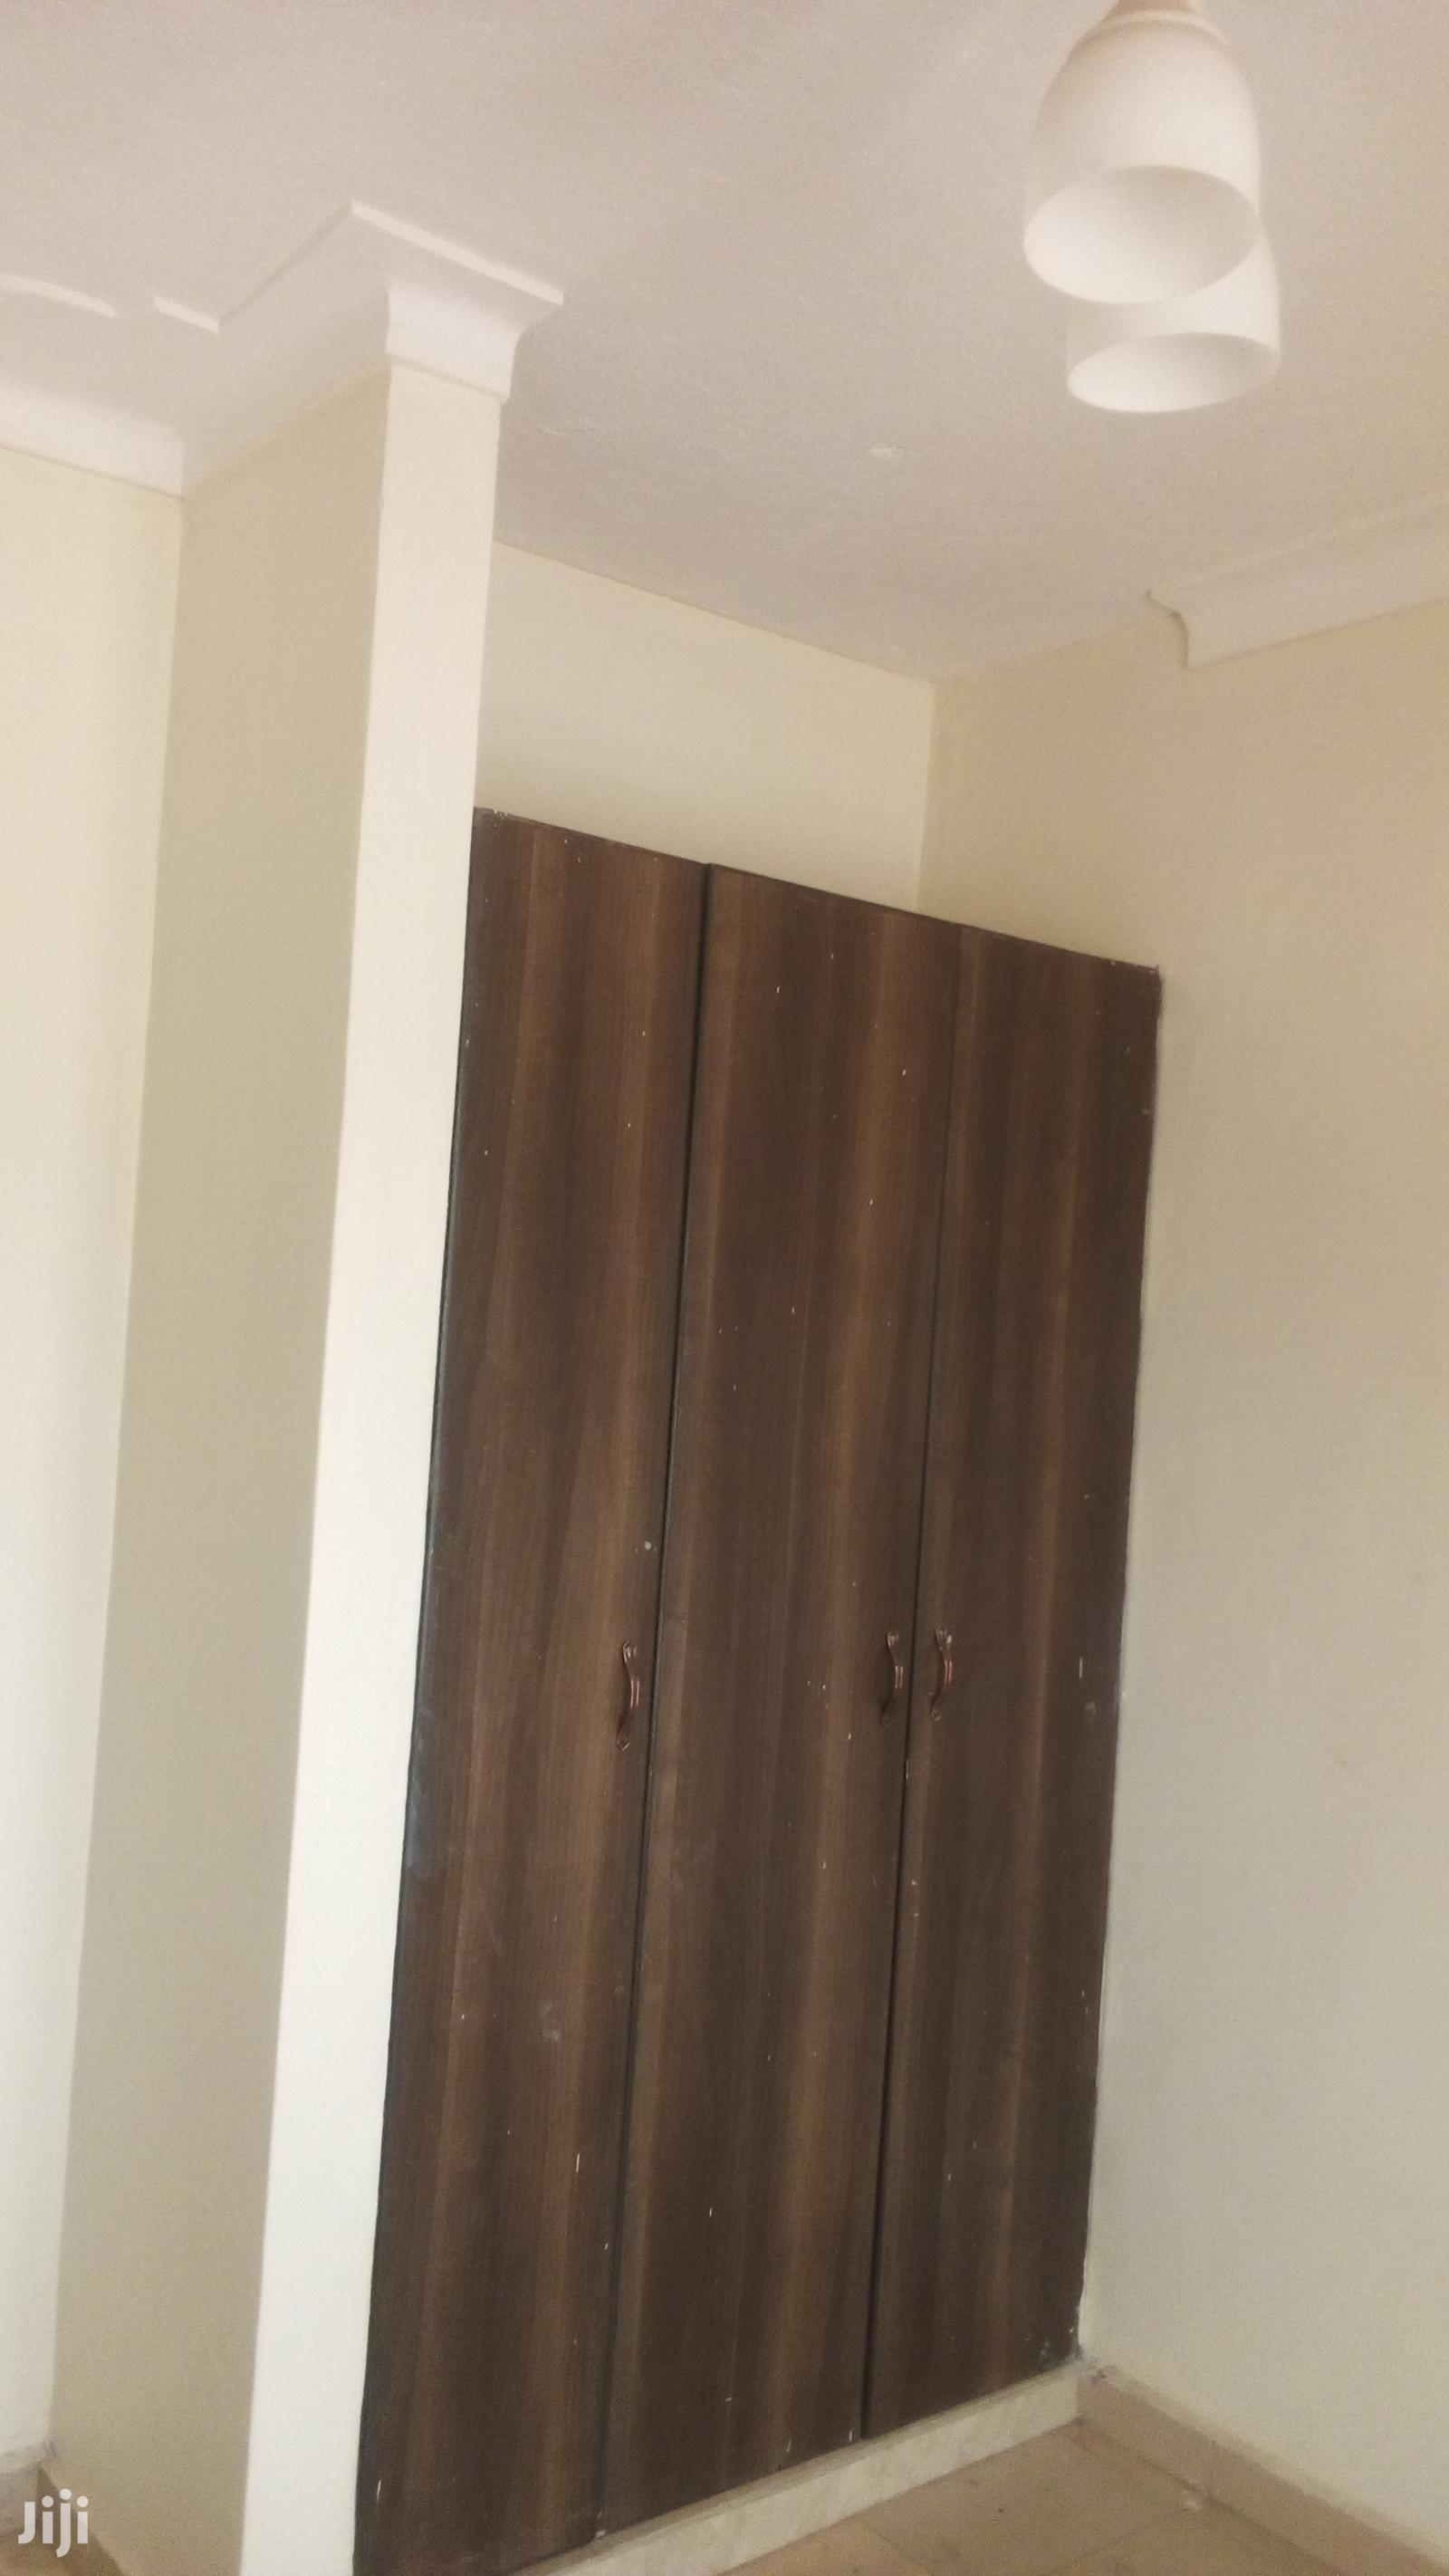 Najjera 2bedrooms 2 Bath's Sitting Room Kitchen Dinning Room | Houses & Apartments For Rent for sale in Kampala, Central Region, Uganda